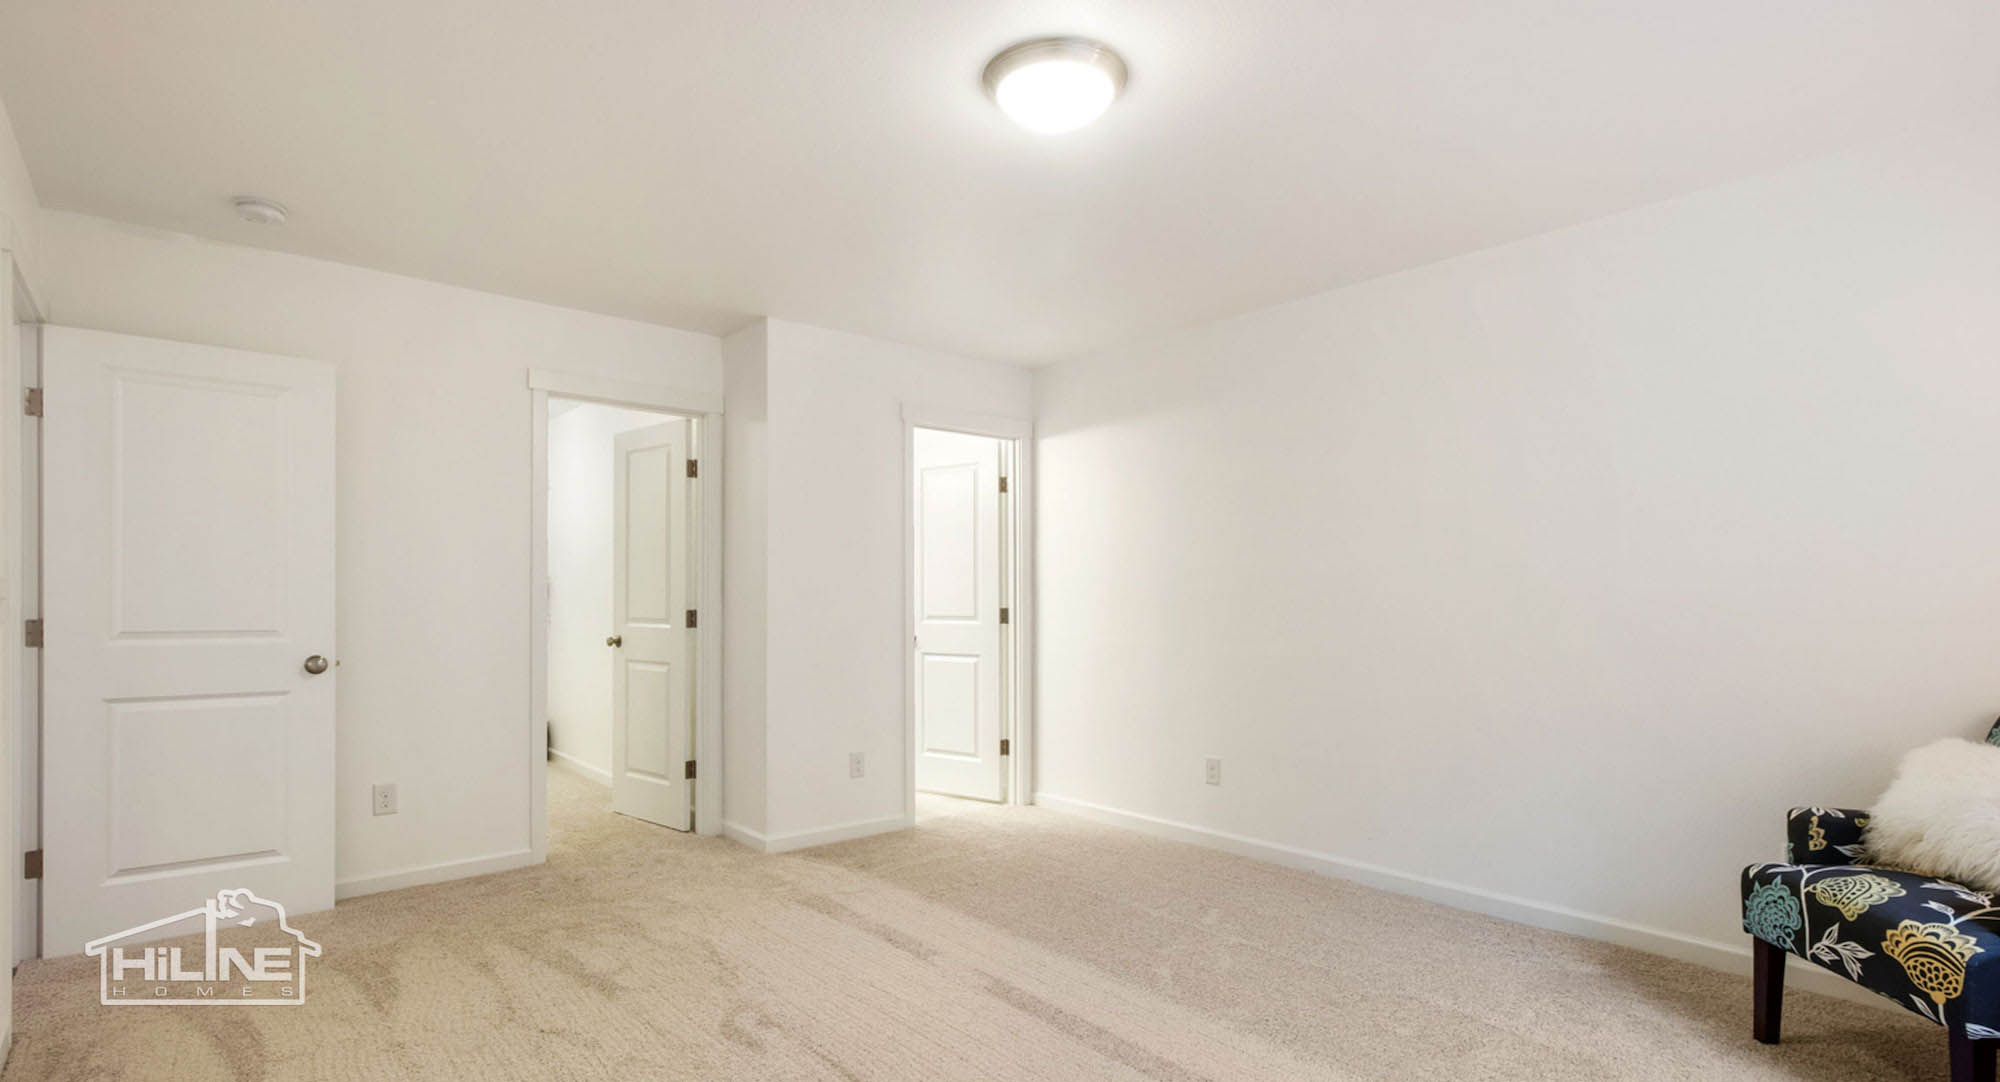 HiLine Home Plan 1491 Master Suite